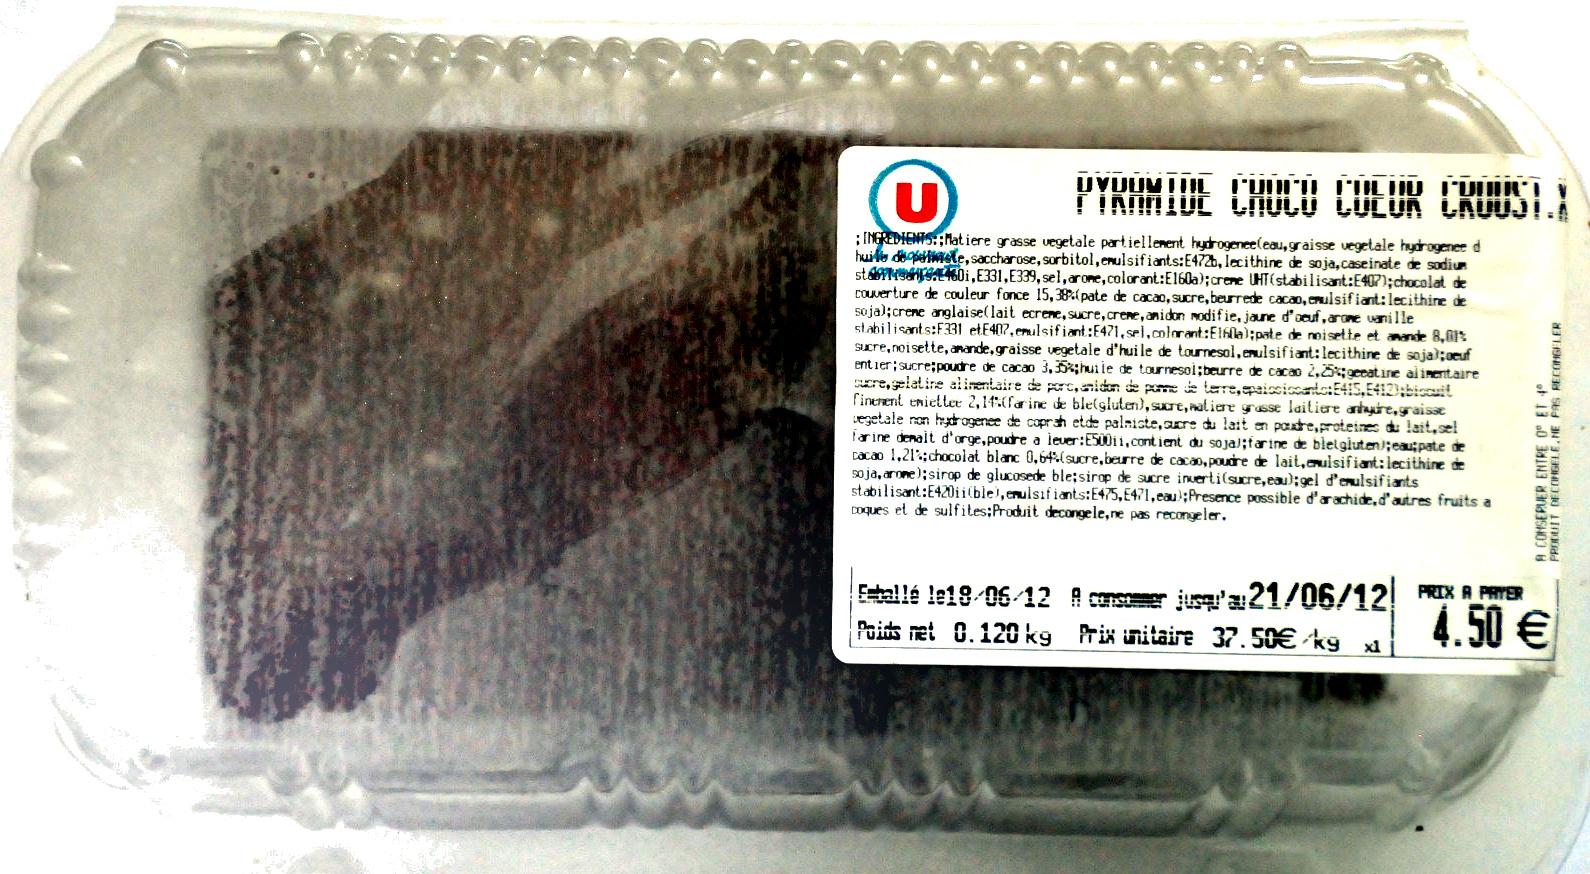 Pyramide choco coeur croustillant - Product